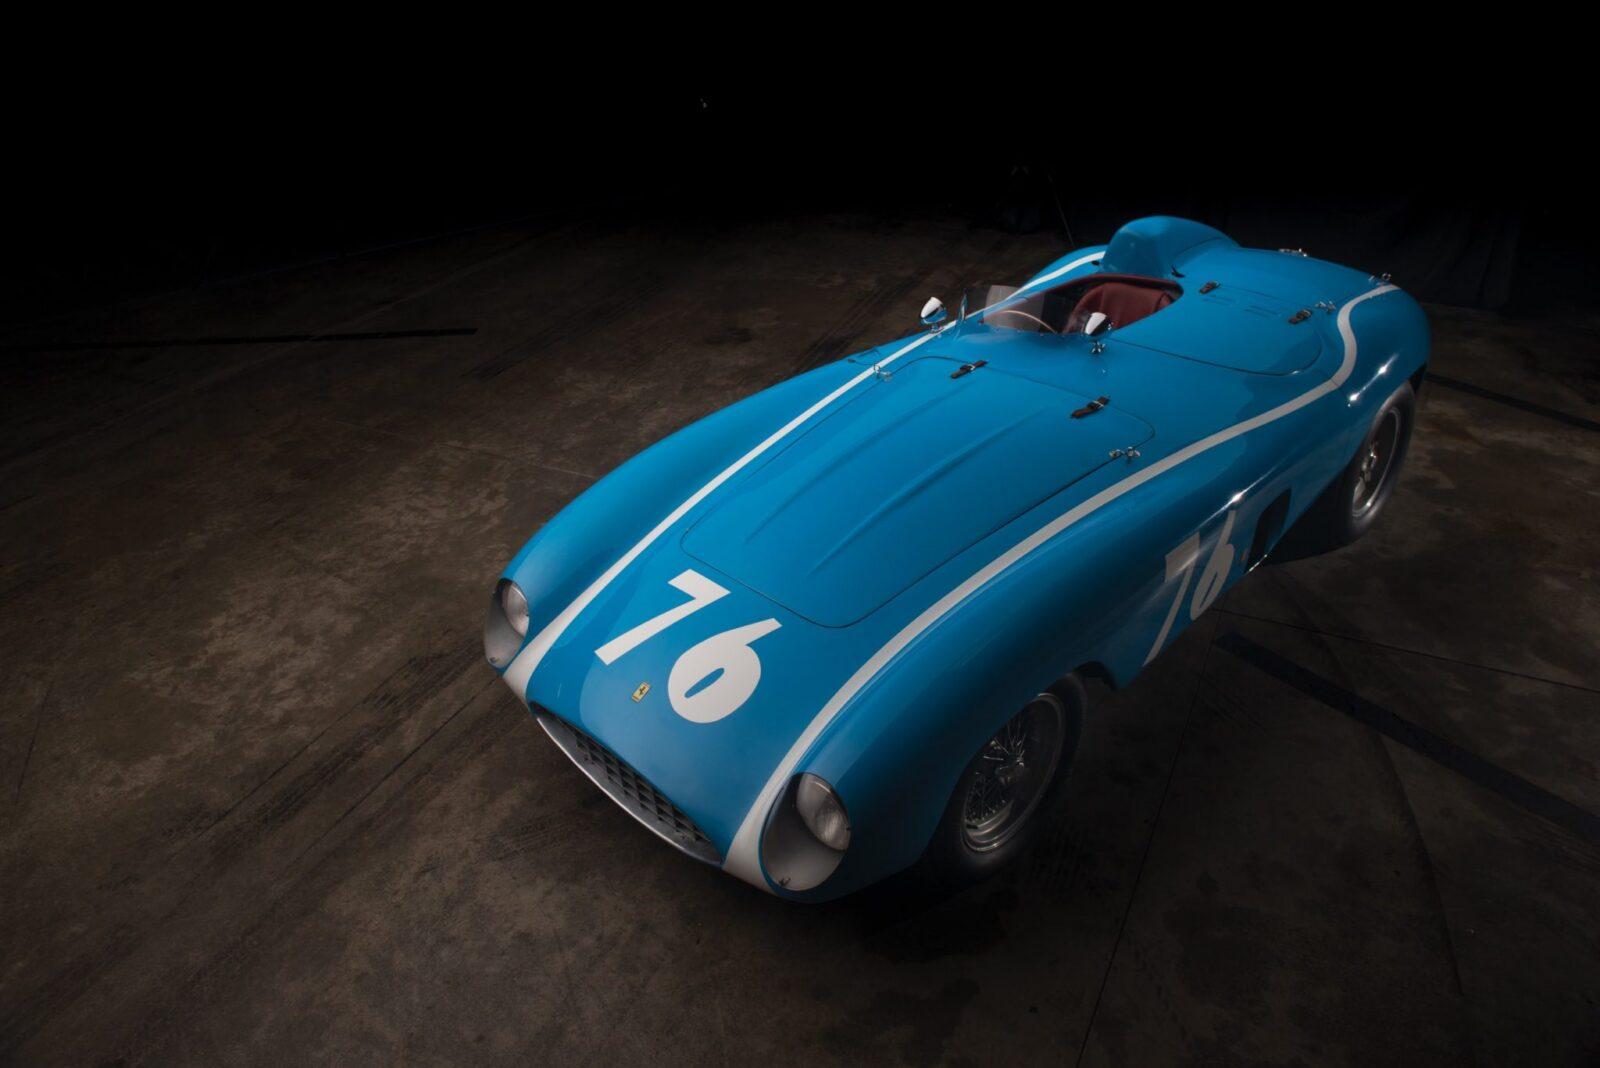 ferrari 121 lm spider 1 1600x1068 - 1955 Ferrari 121 LM